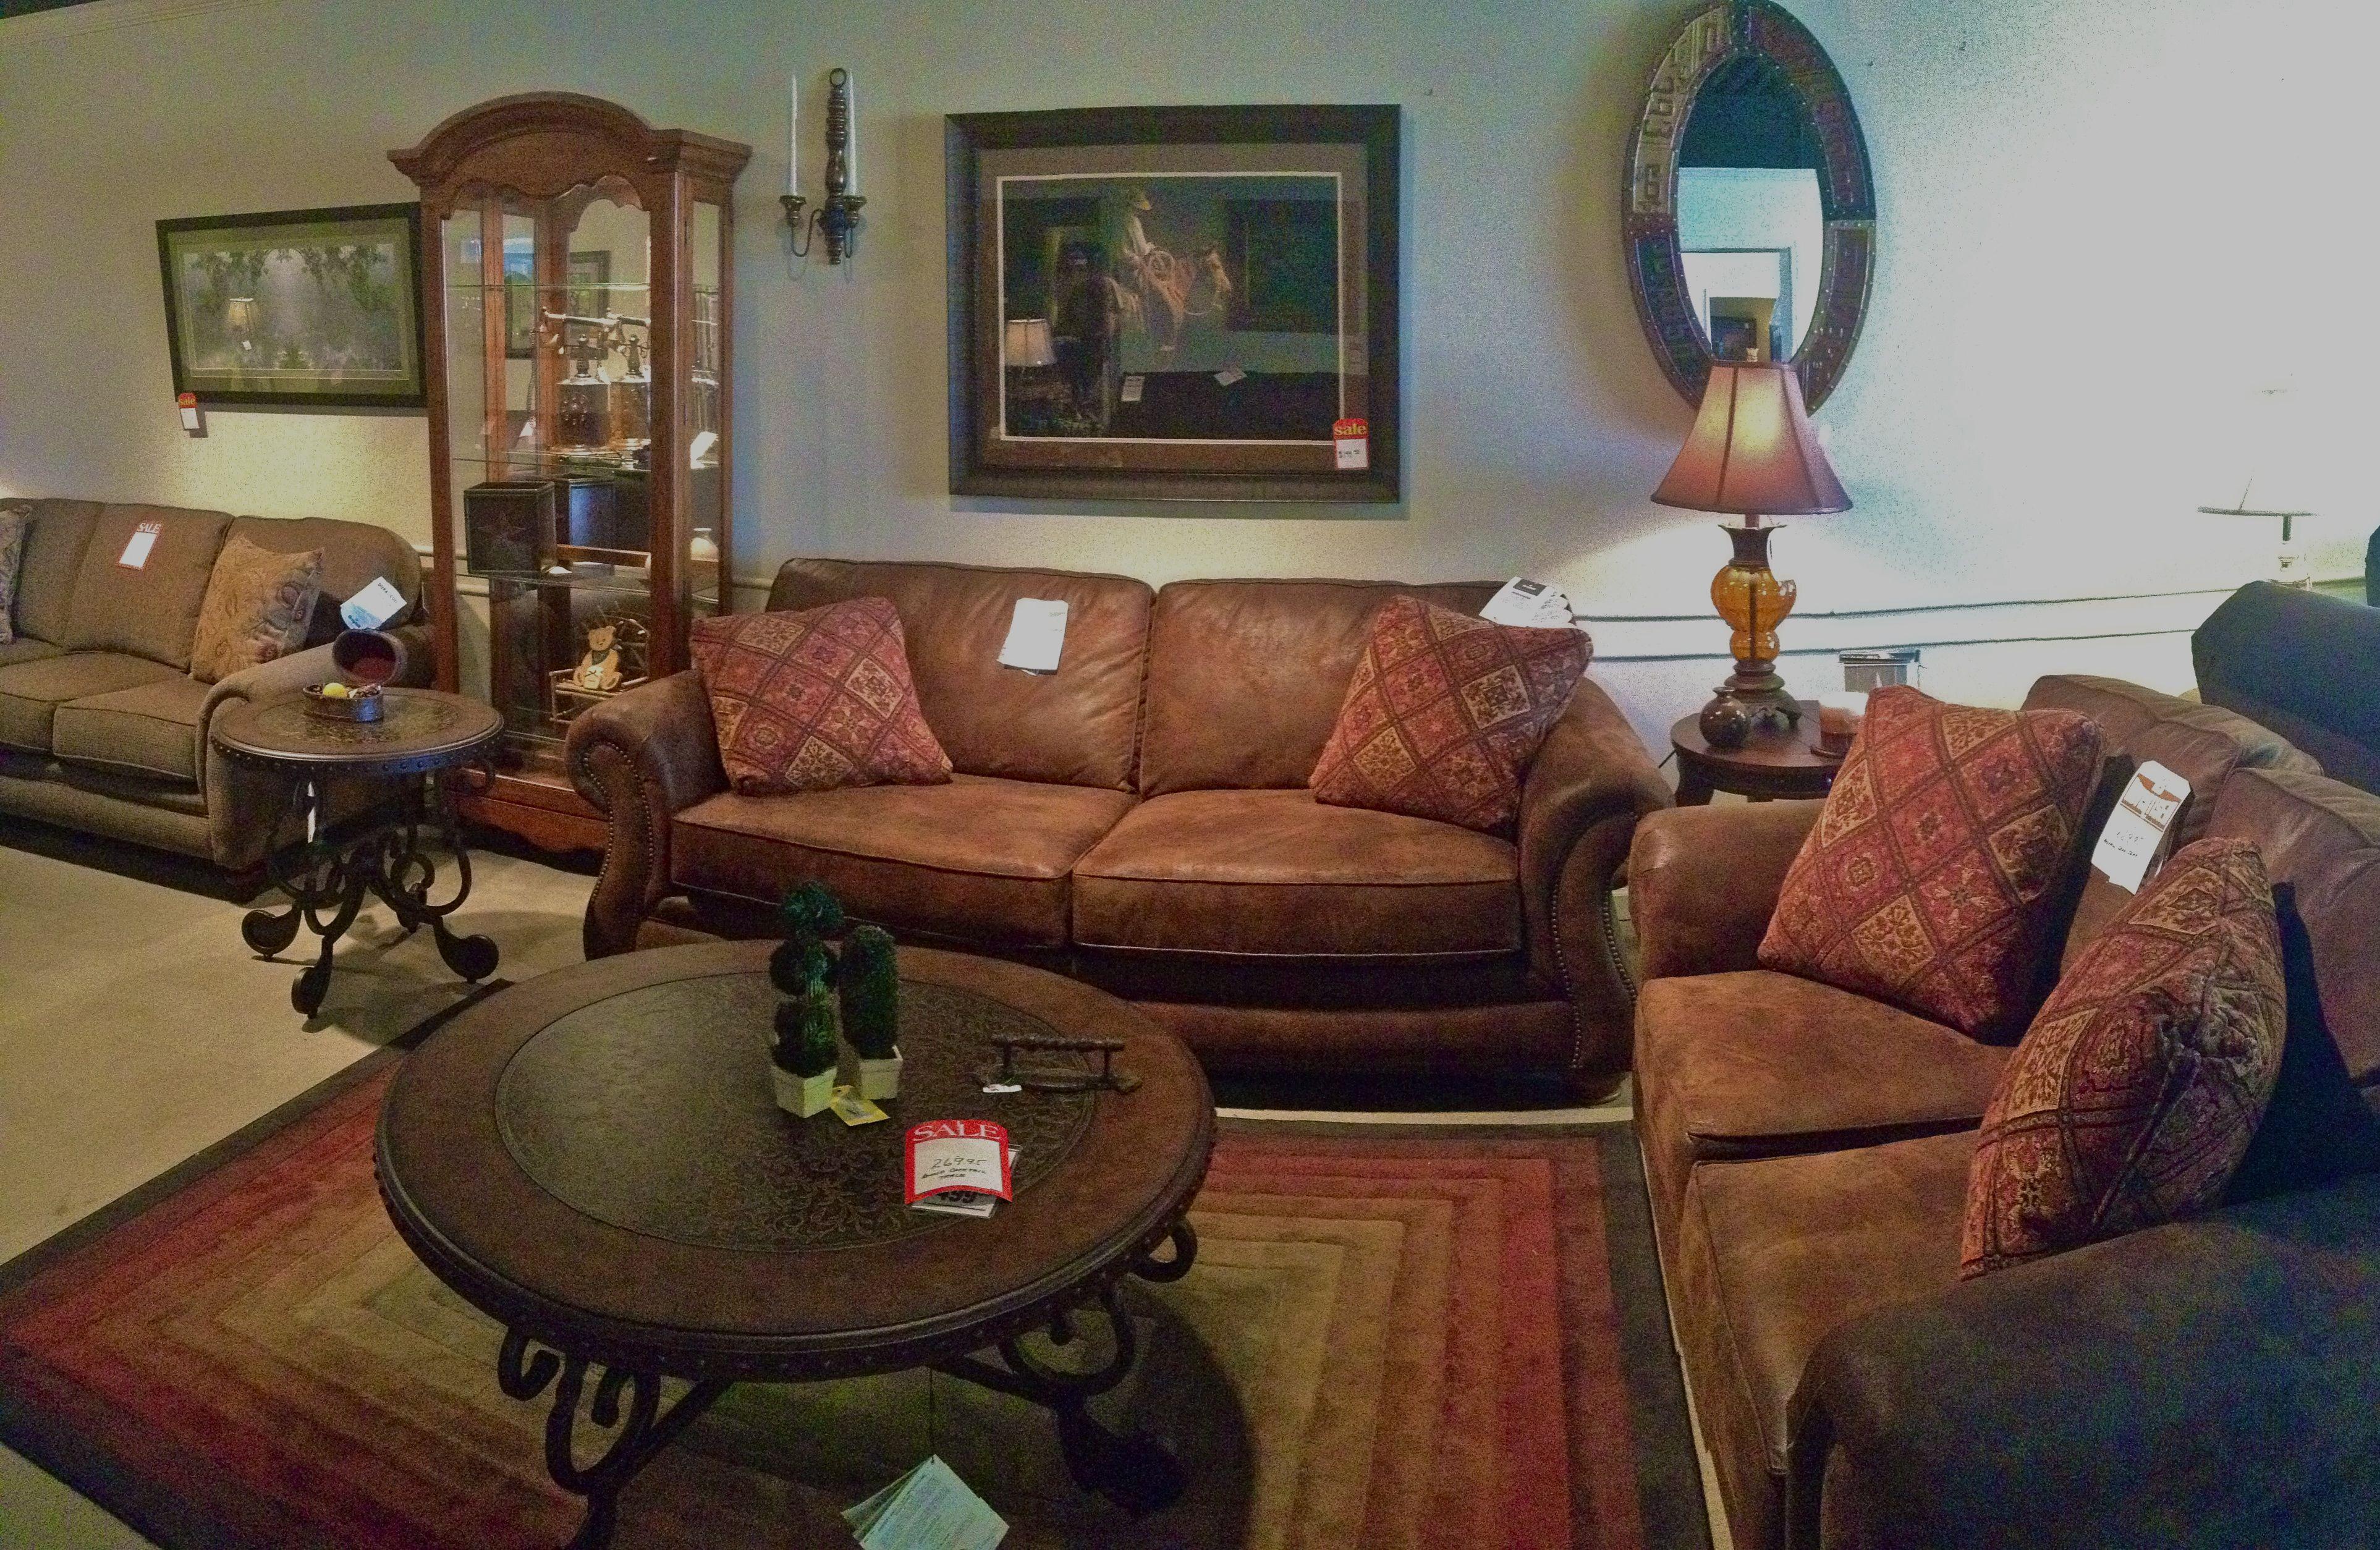 Western country cowboy folk art themed living room couches by western country cowboy folk art themed living room couches by broyhill rug from oriental weavers designed publicscrutiny Choice Image